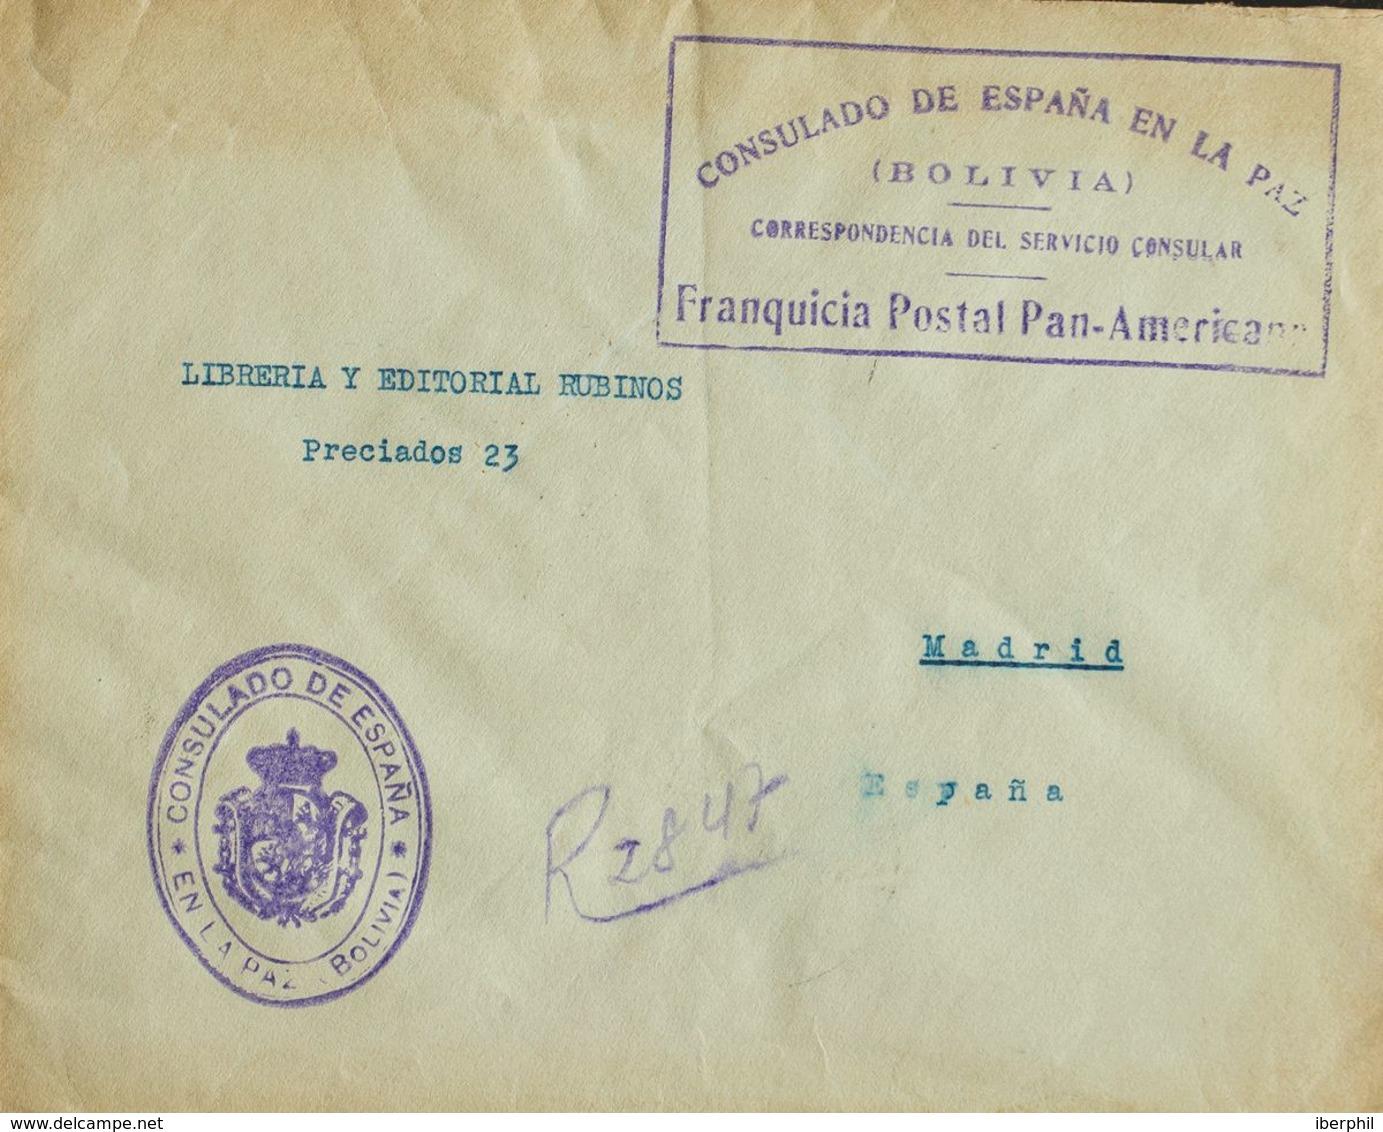 Bolivia. Sobre Yv . 1926. Certificado De LA PAZ (BOLIVIA) A MADRID. Marca De Franquicia CONSULADO DE ESPAÑA EN LA PAZ / - Bolivia